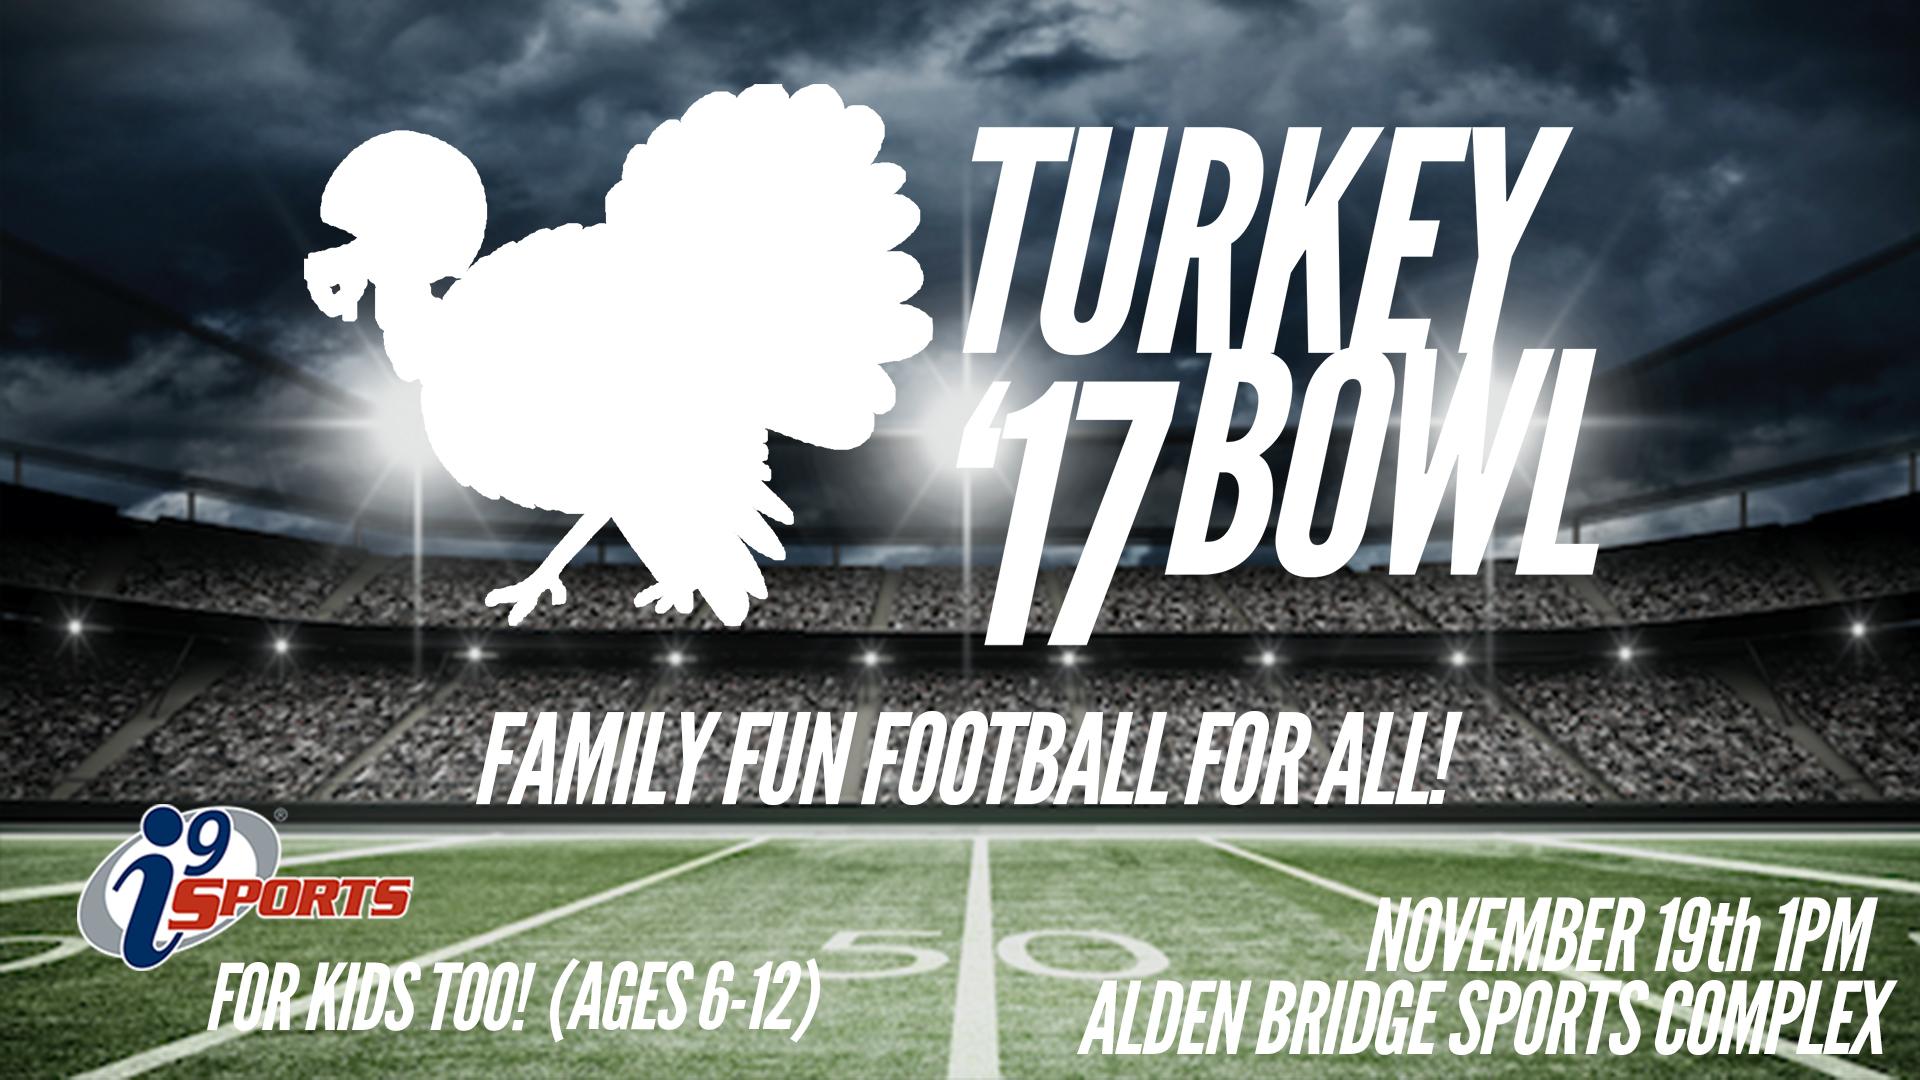 Turkey Bowl '17.jpg